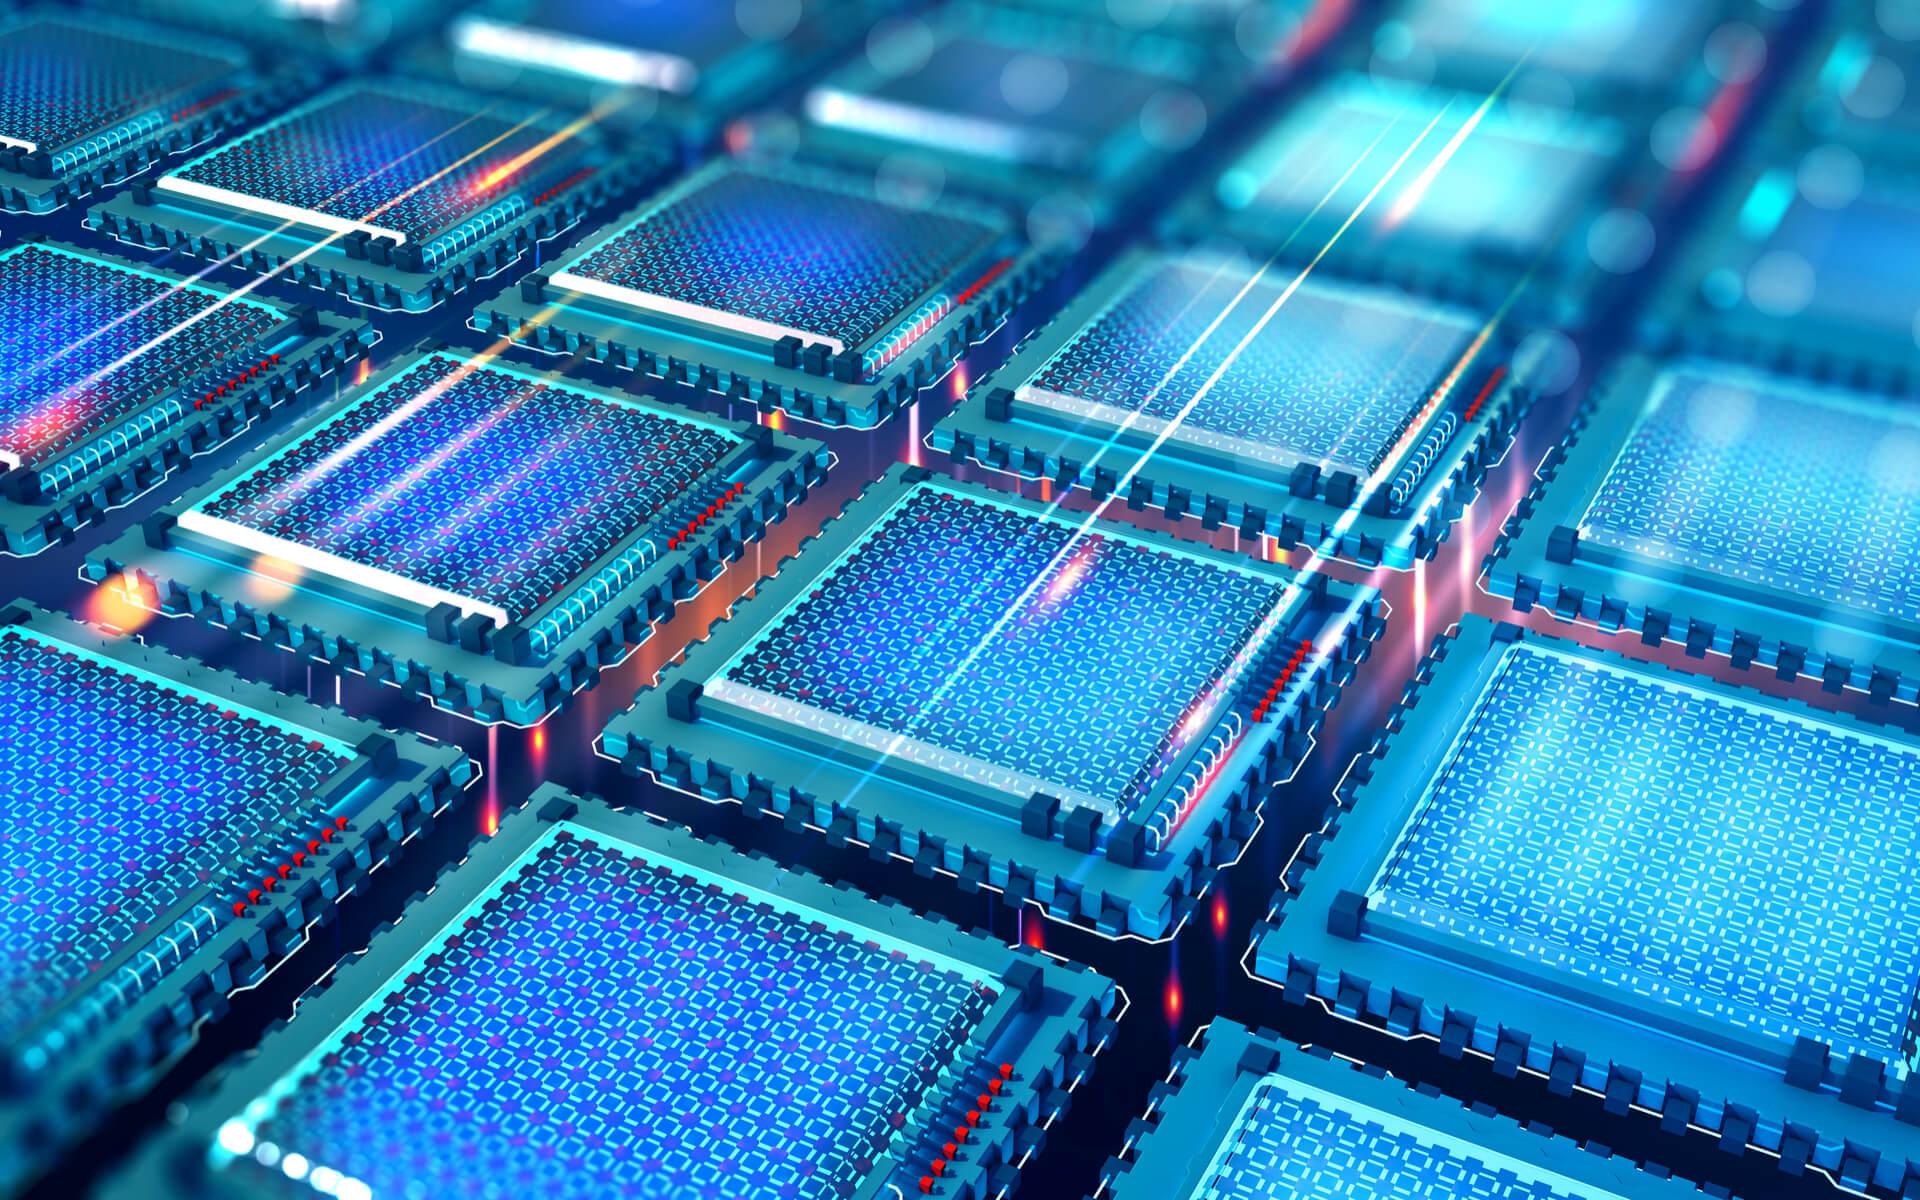 31.10.20 Kvantové počítače a kryptomeny